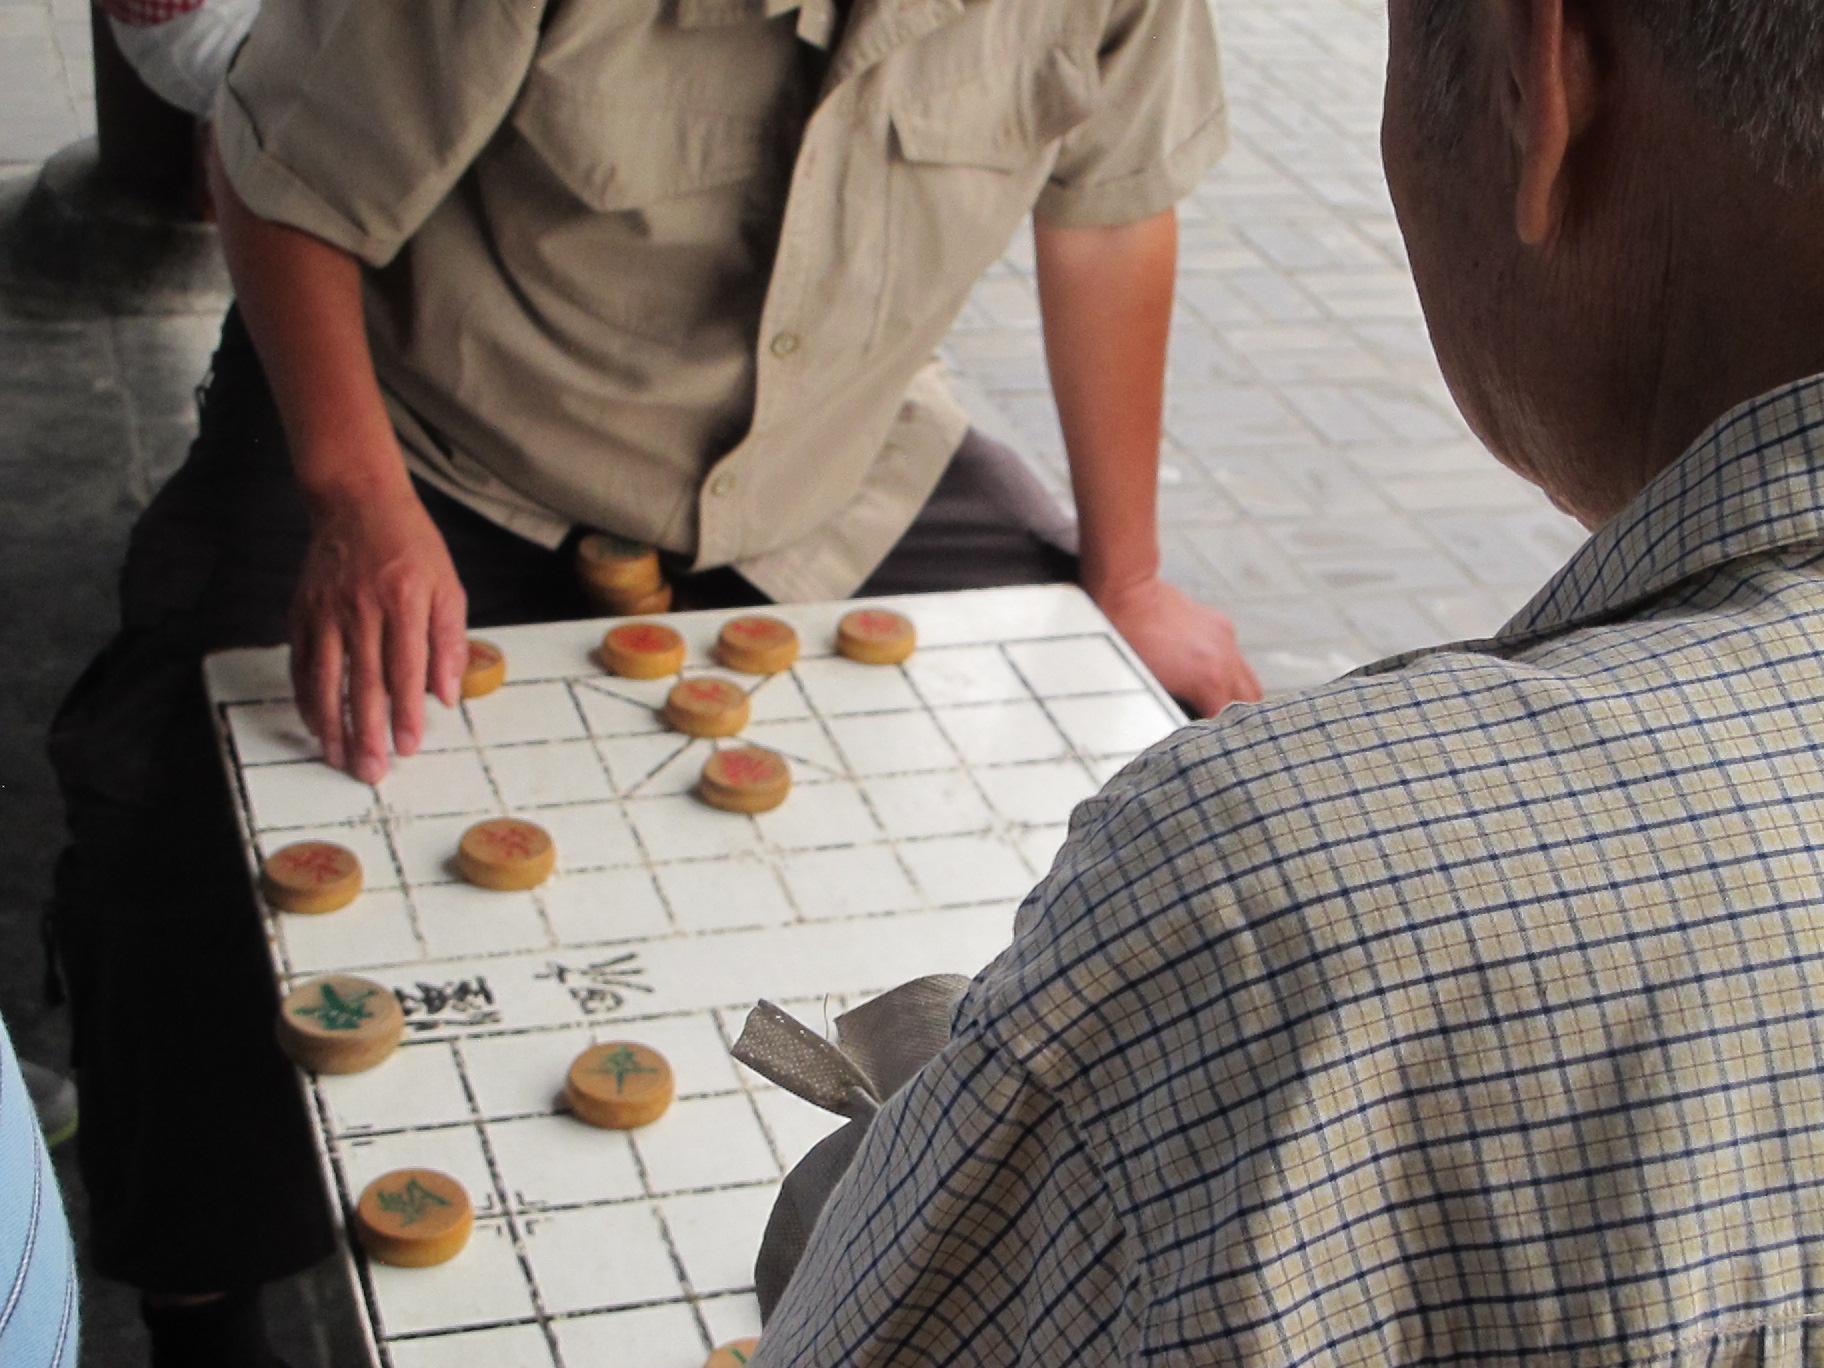 chinese checkers anyone